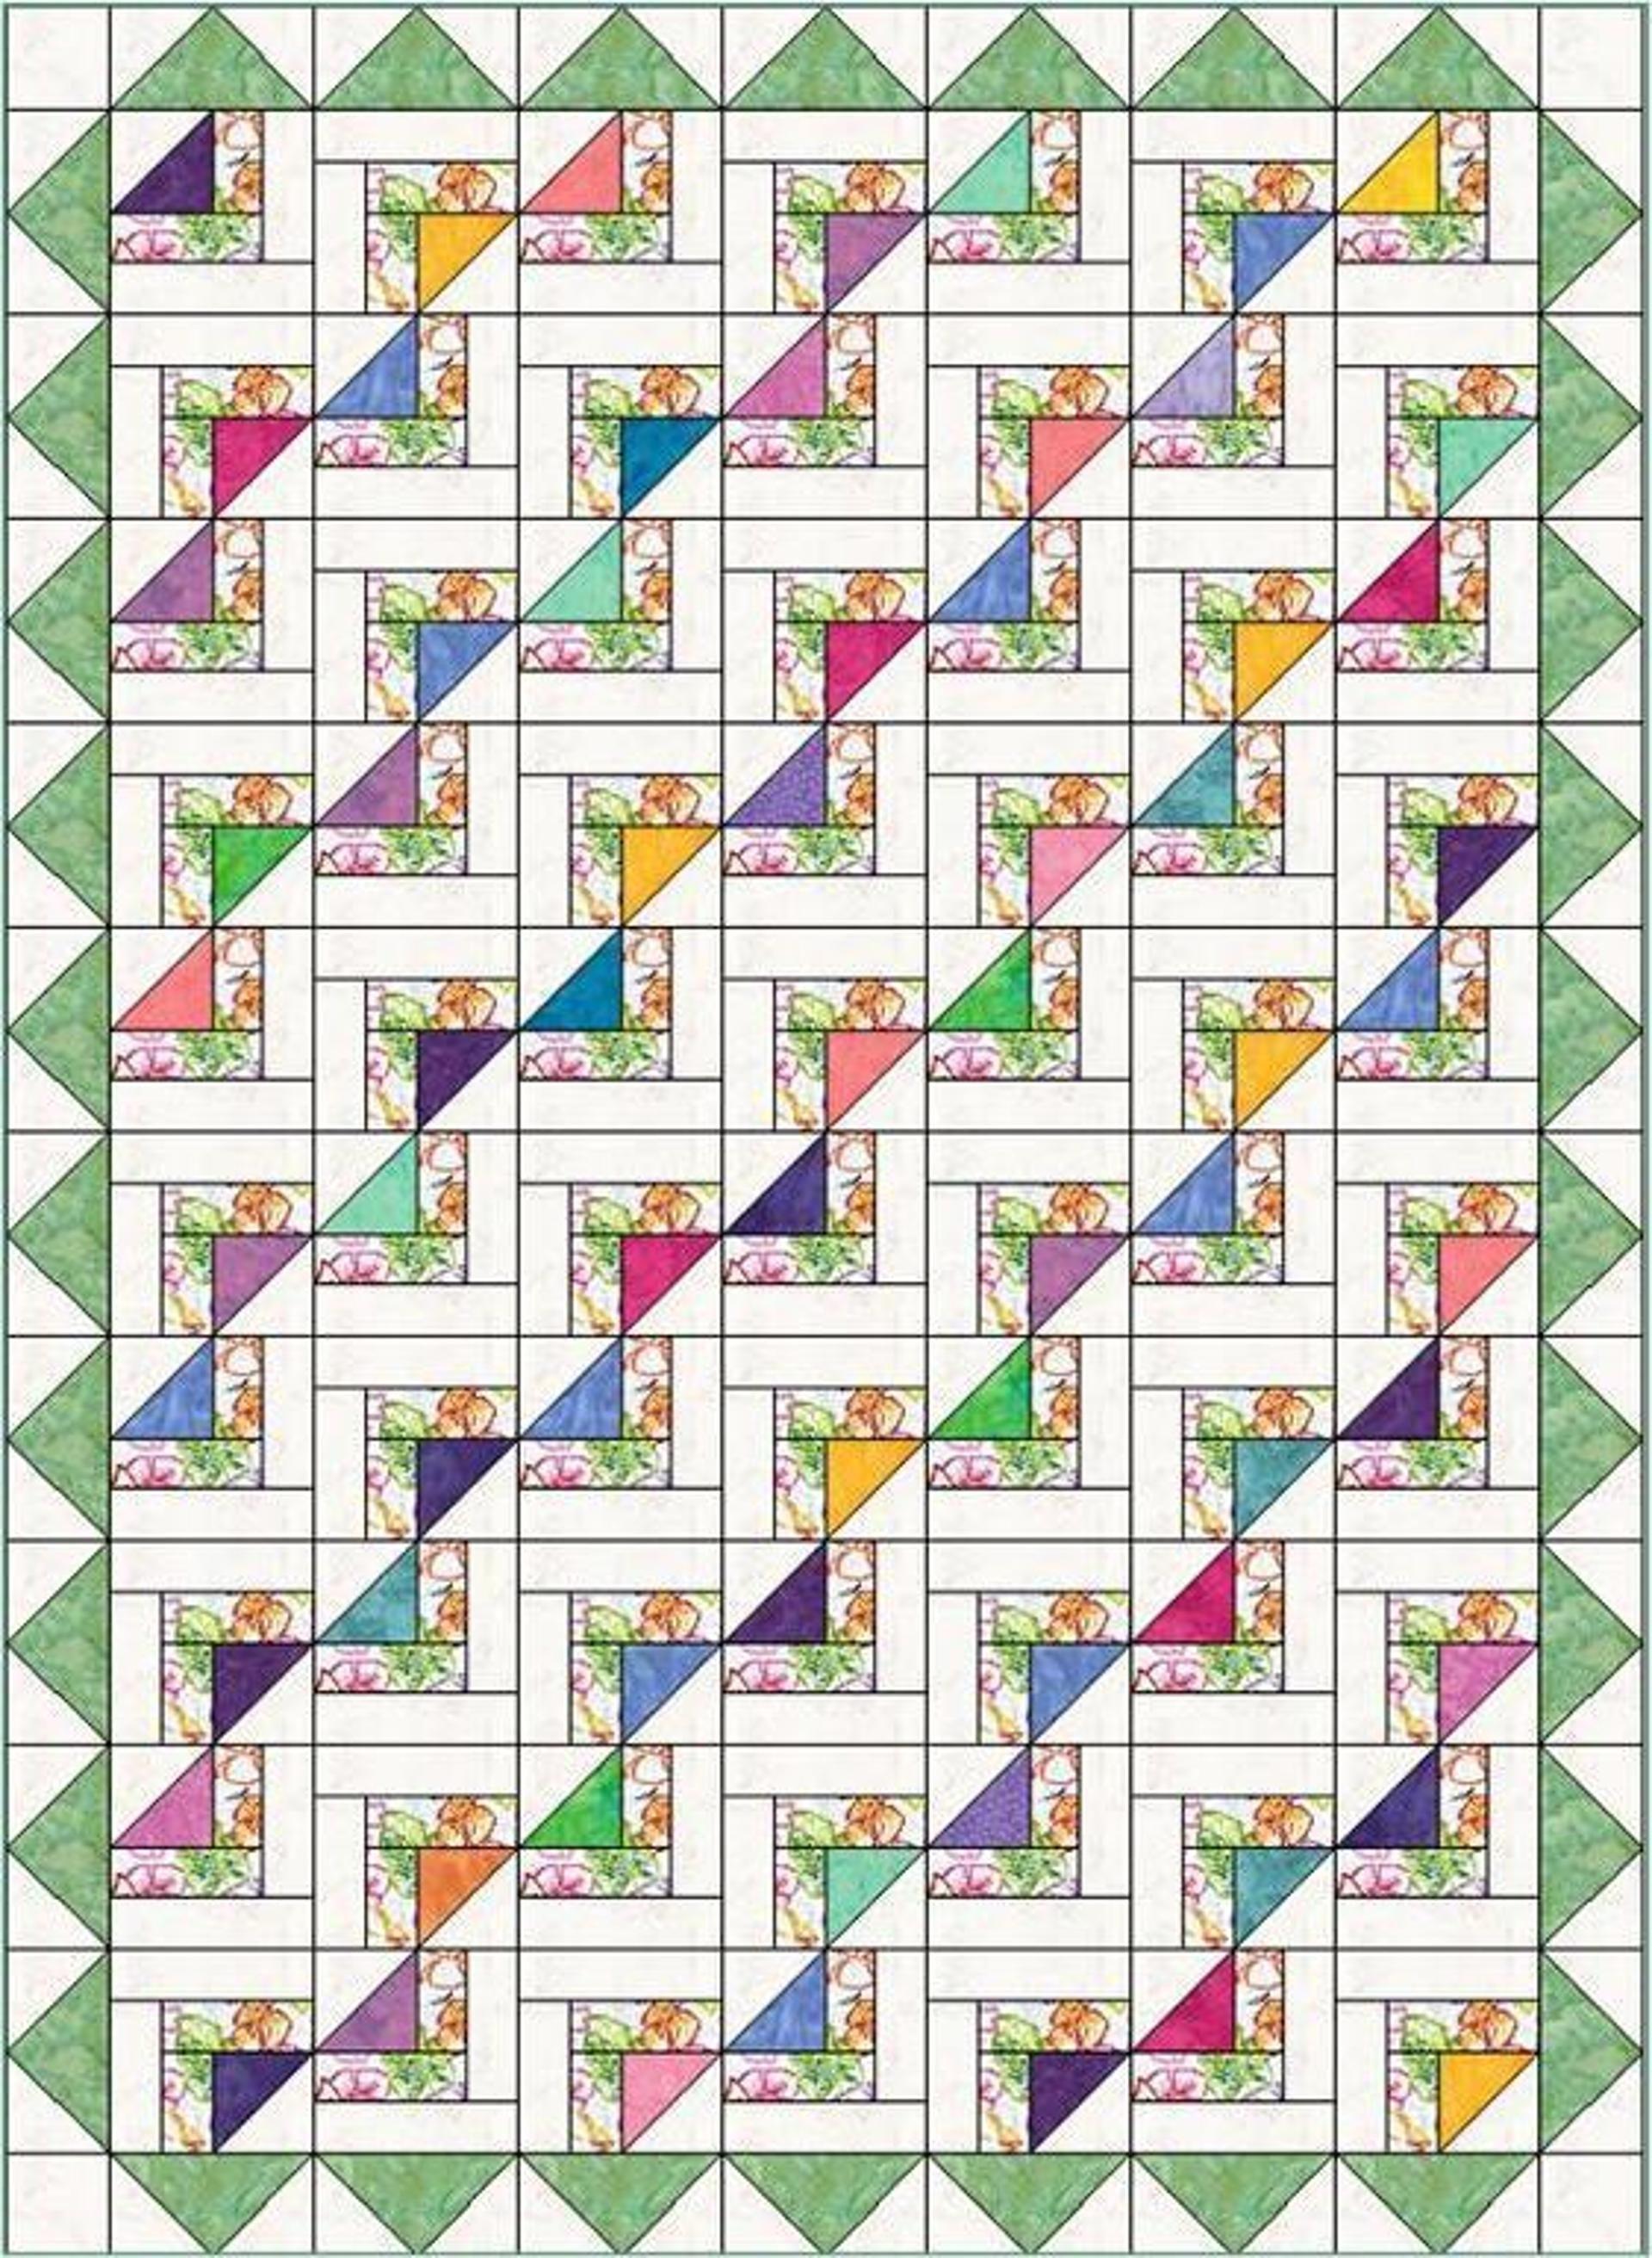 Newport Fantasy Quilt Pattern | pola utk runner dr perca | Pinterest ...